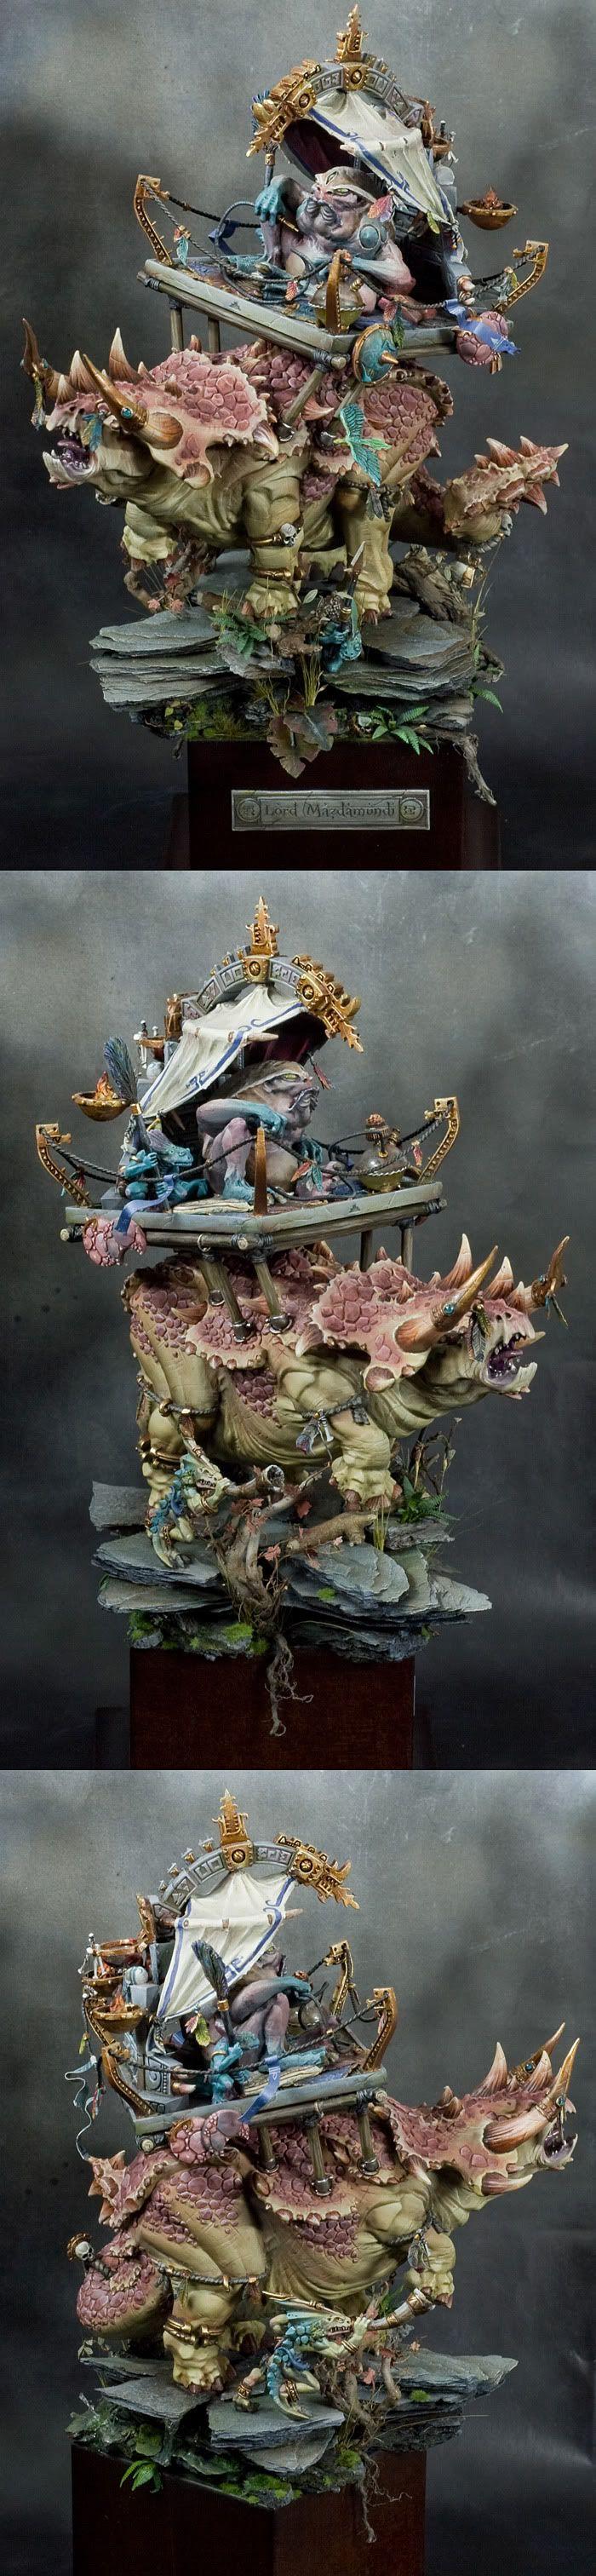 golden demon winner, Mazdamundi!!!!!!!!!!!!!!!! he just rides a stegadon 'couse he's friggin awsome